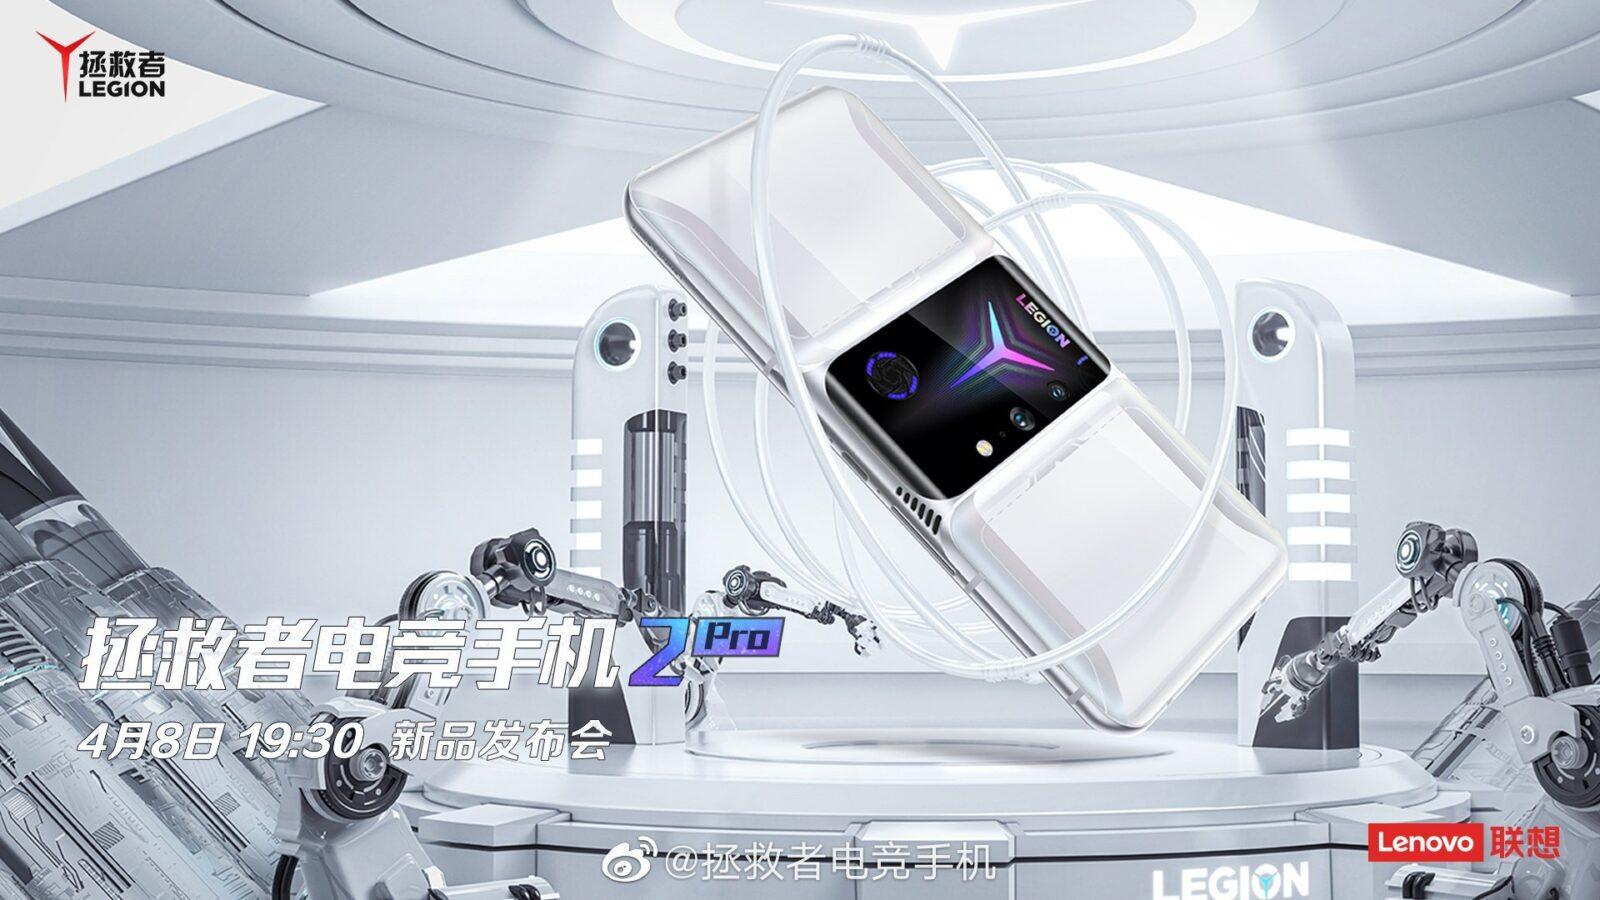 lenovo-legion-2-pro-smartphone-gaming-innovant